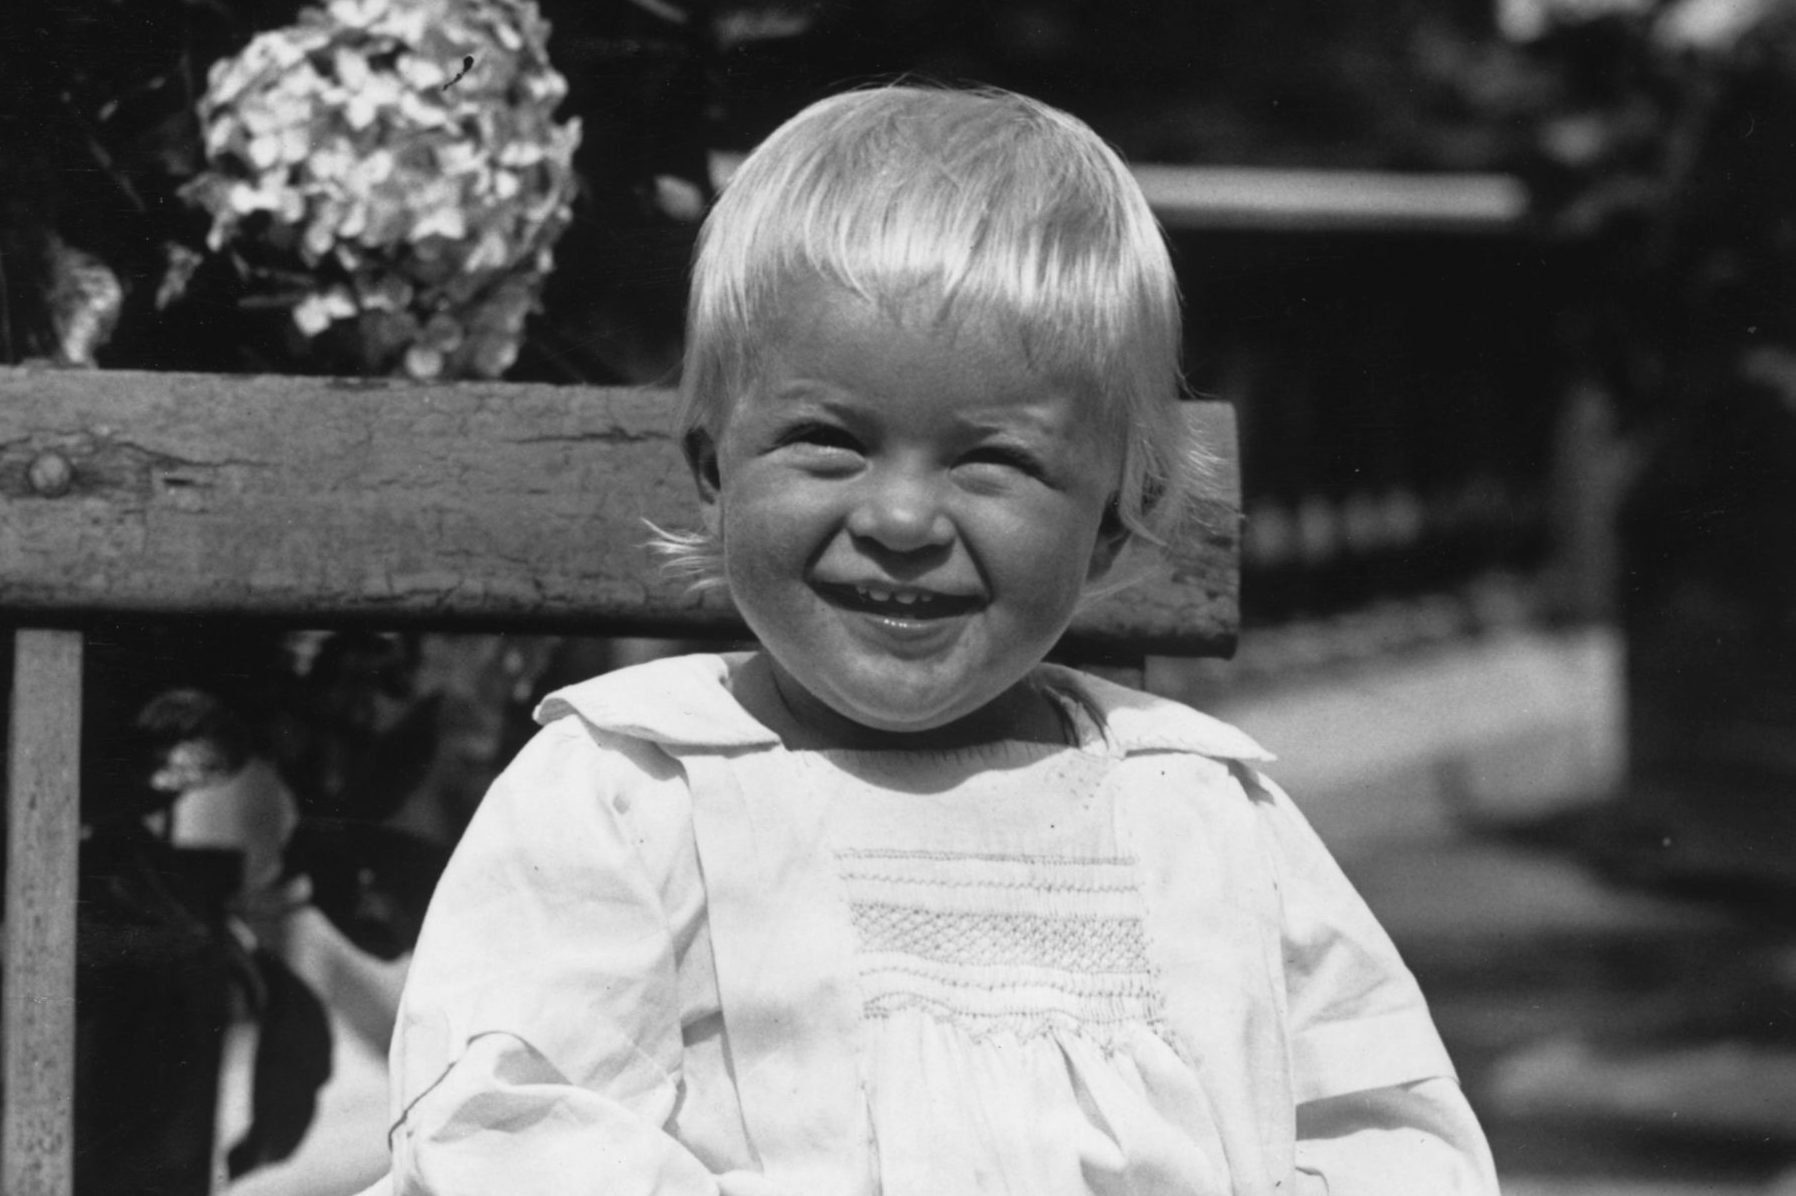 Baby Prince Philip